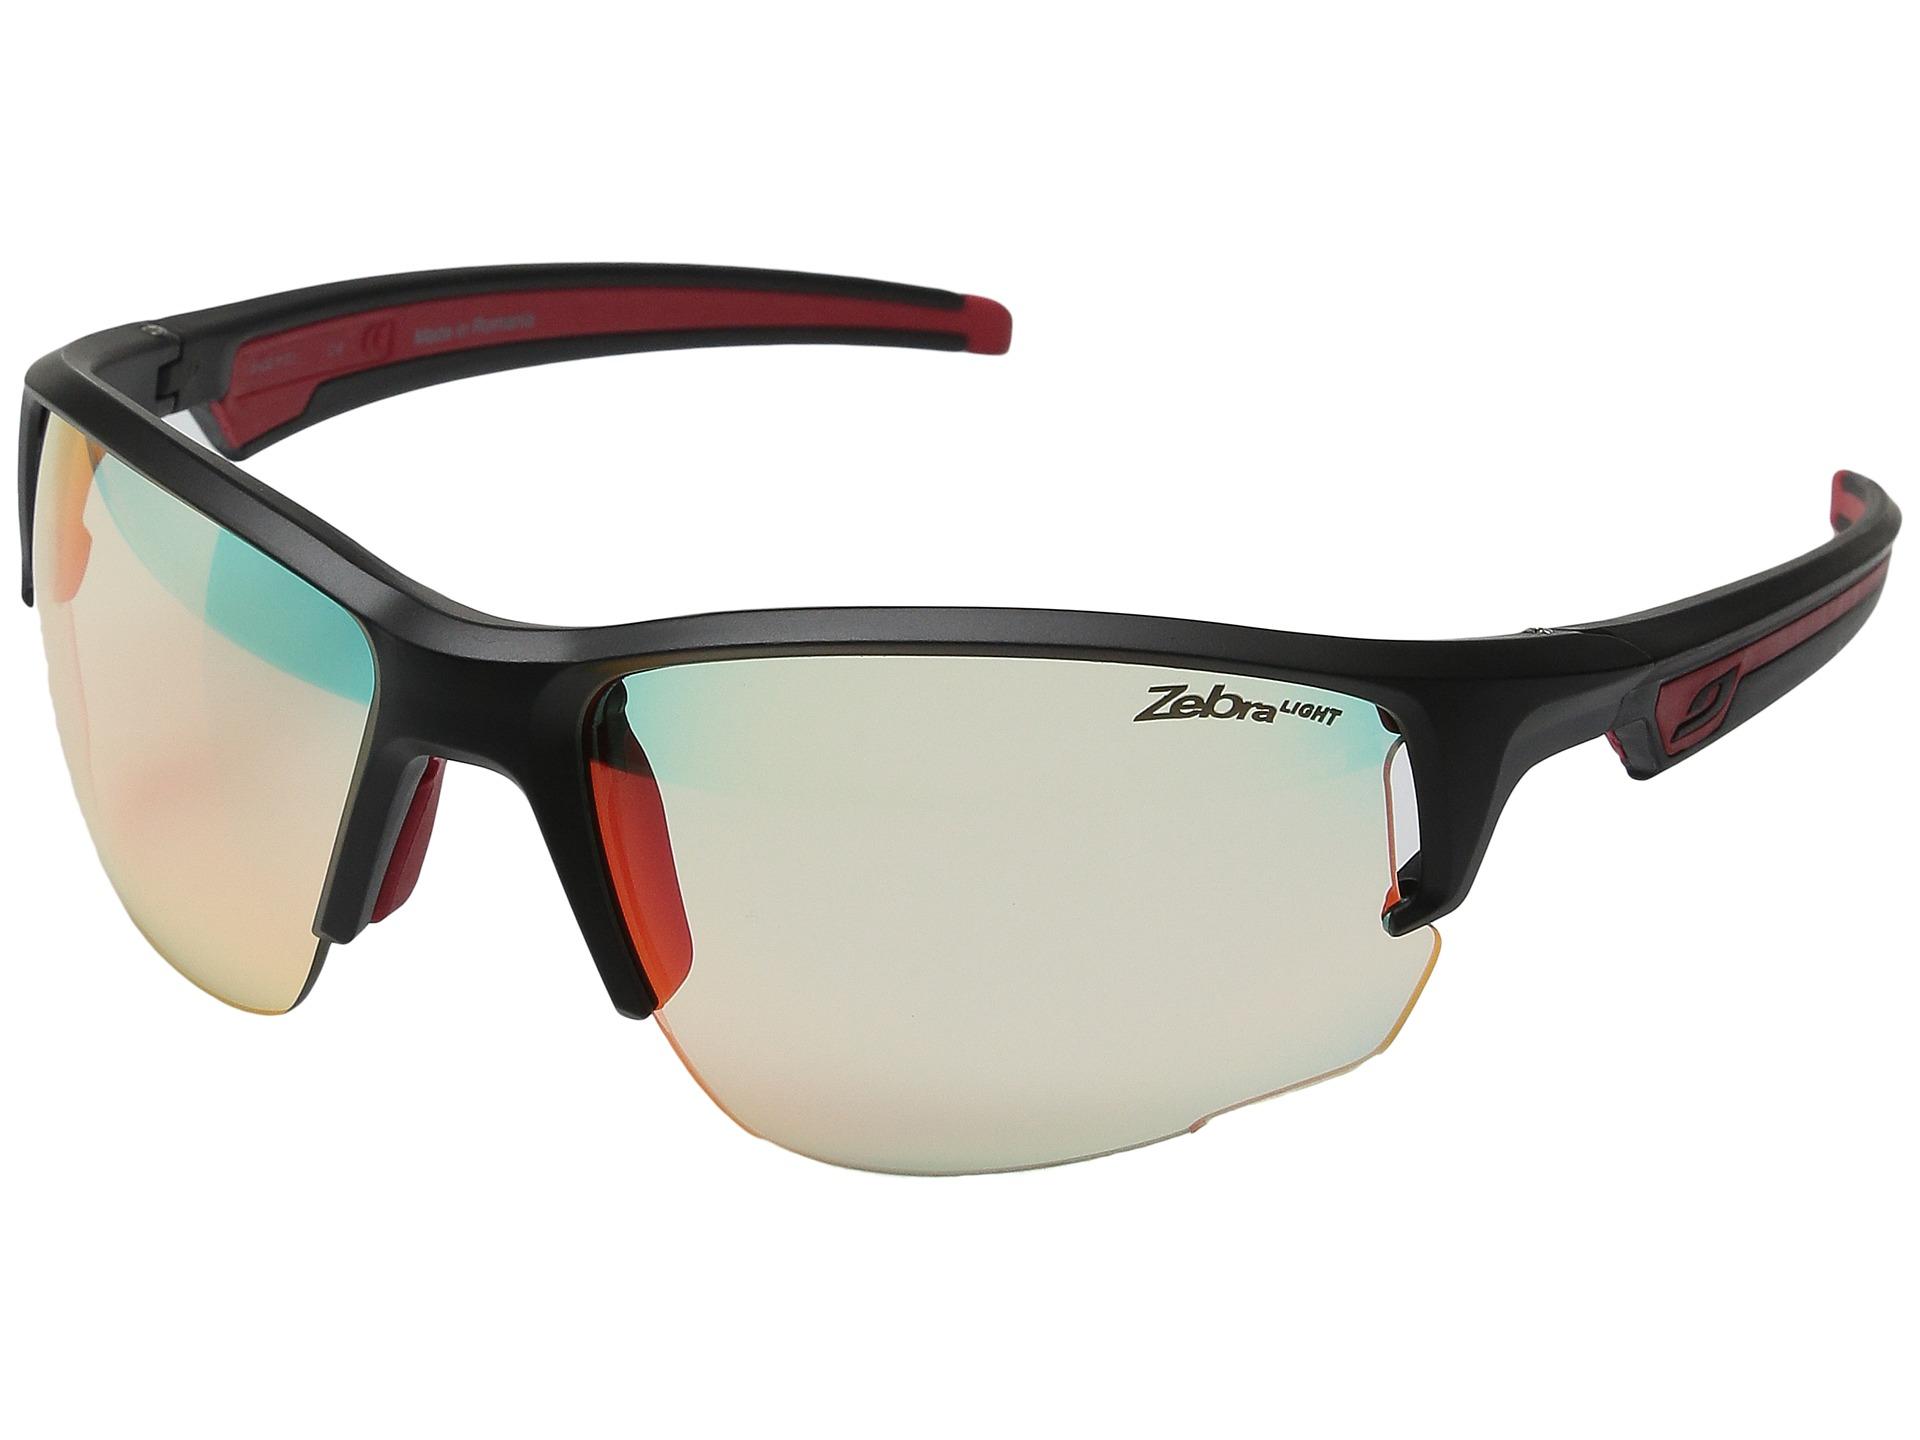 66ad53aae4 Julbo Trek Sunglasses Review